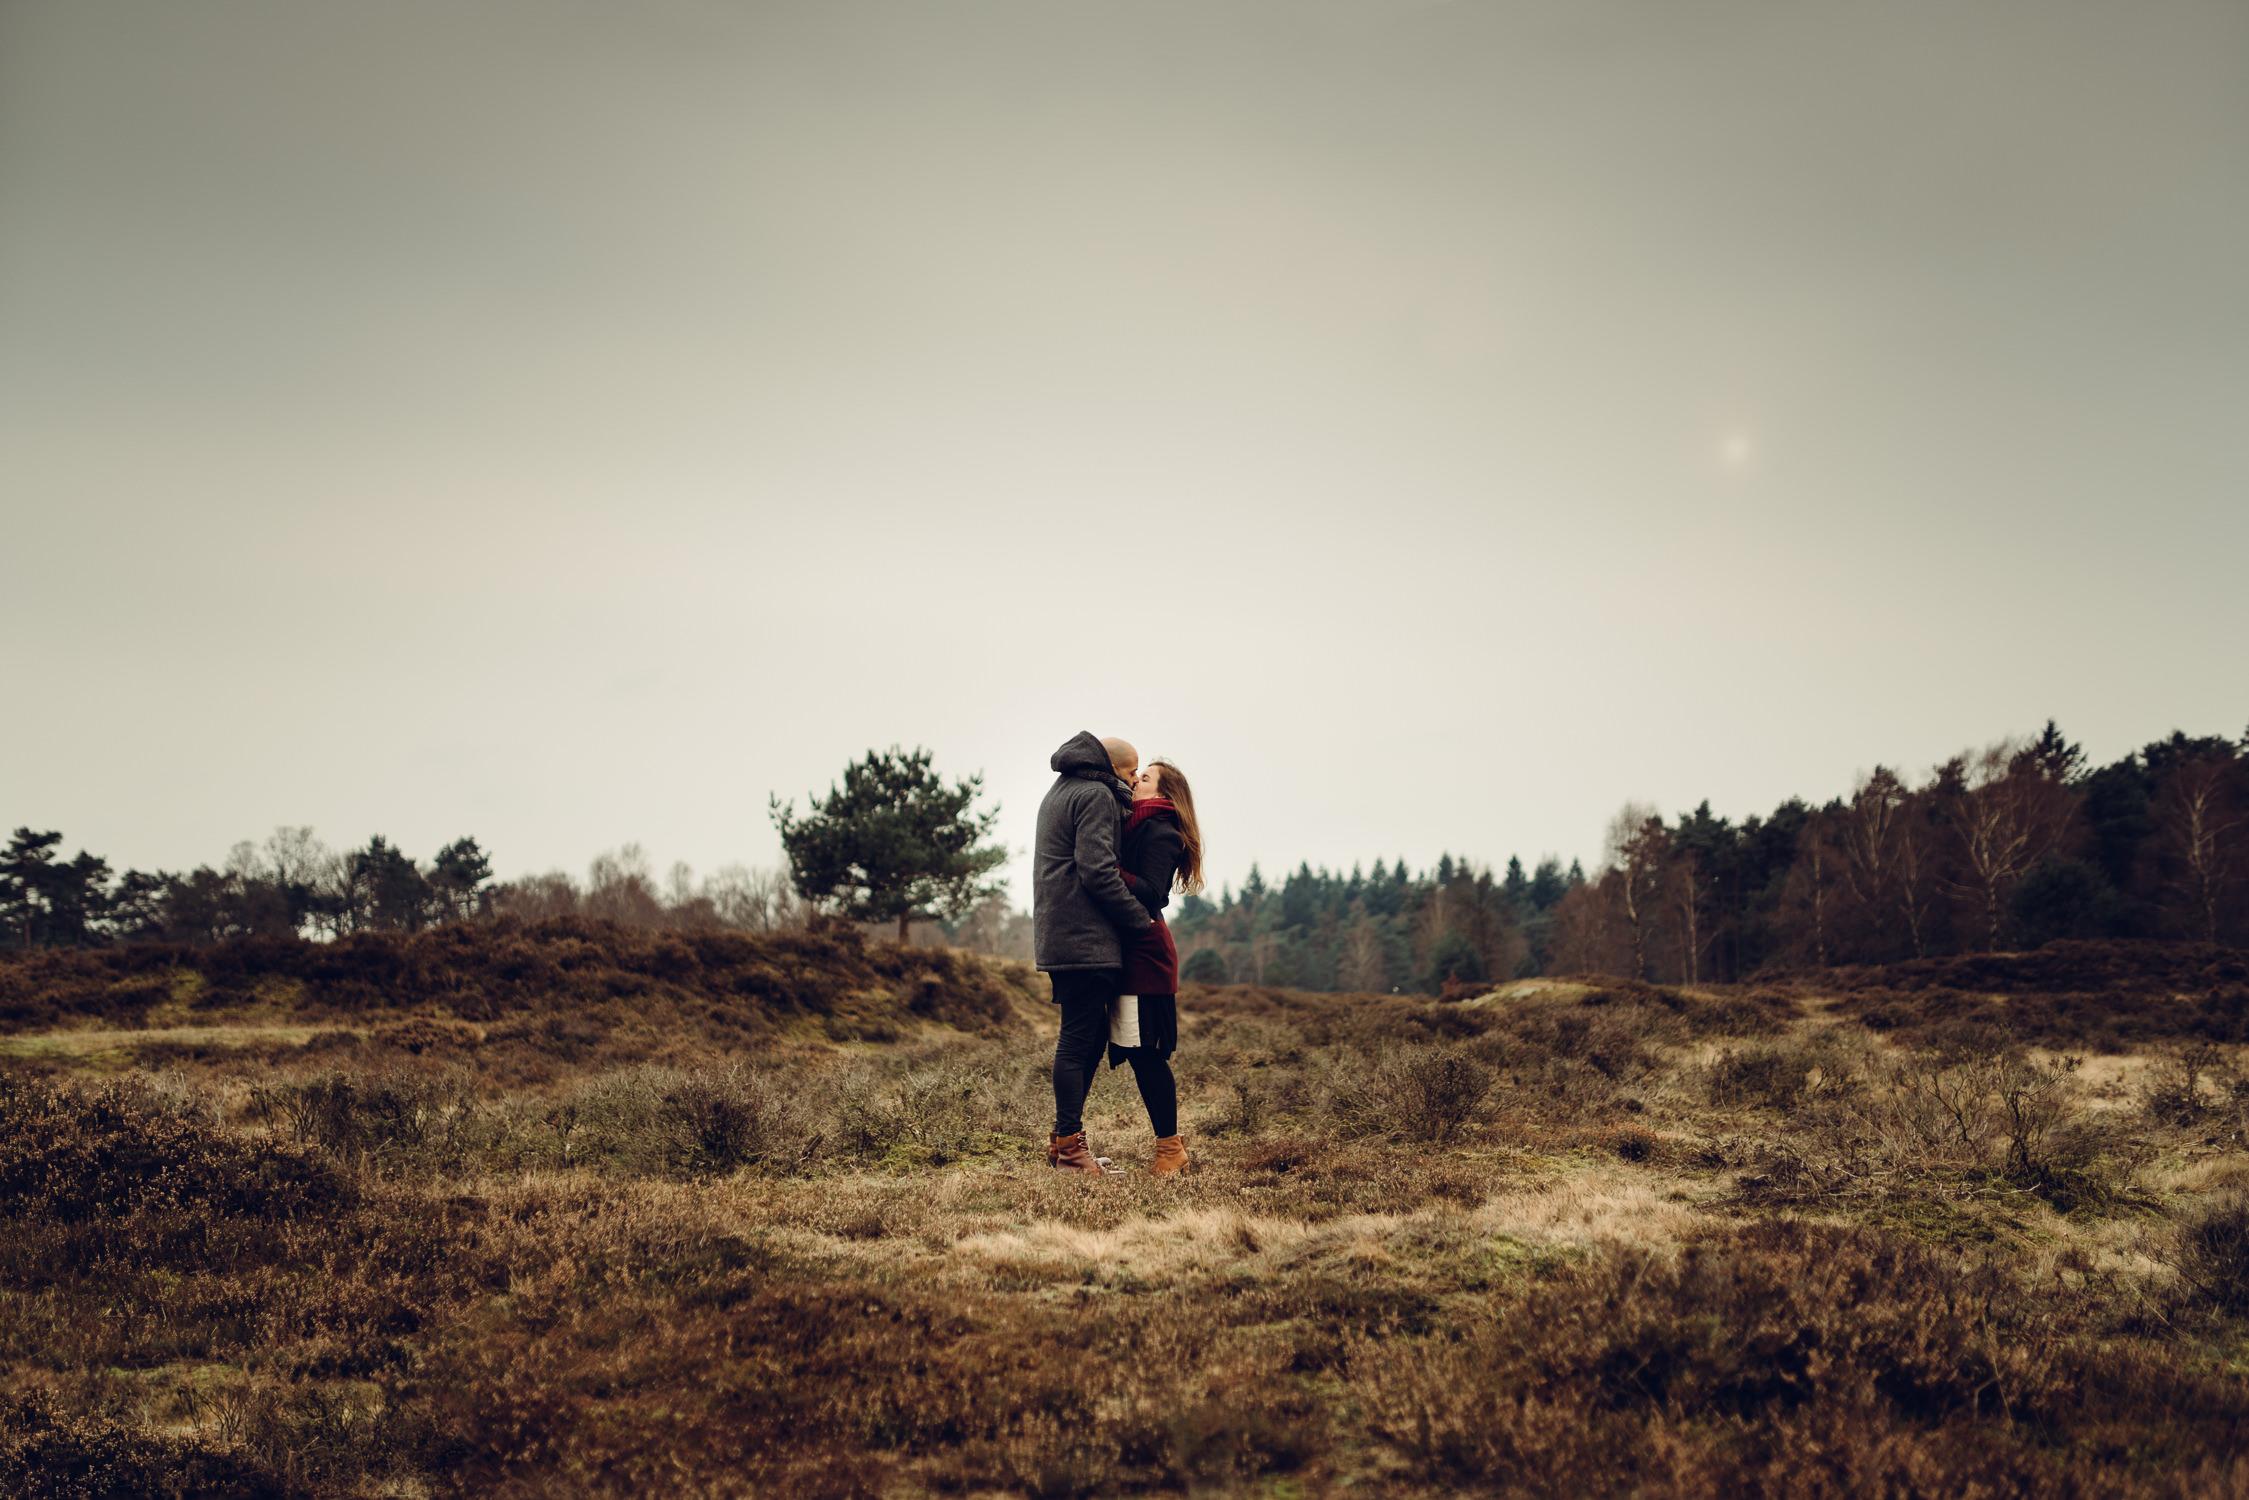 bruidsfotografie-loveshoot-amsterdam-rotterdam-utrecht-mark-hadden-wedding-photographer-bianca-rutger-242.jpg